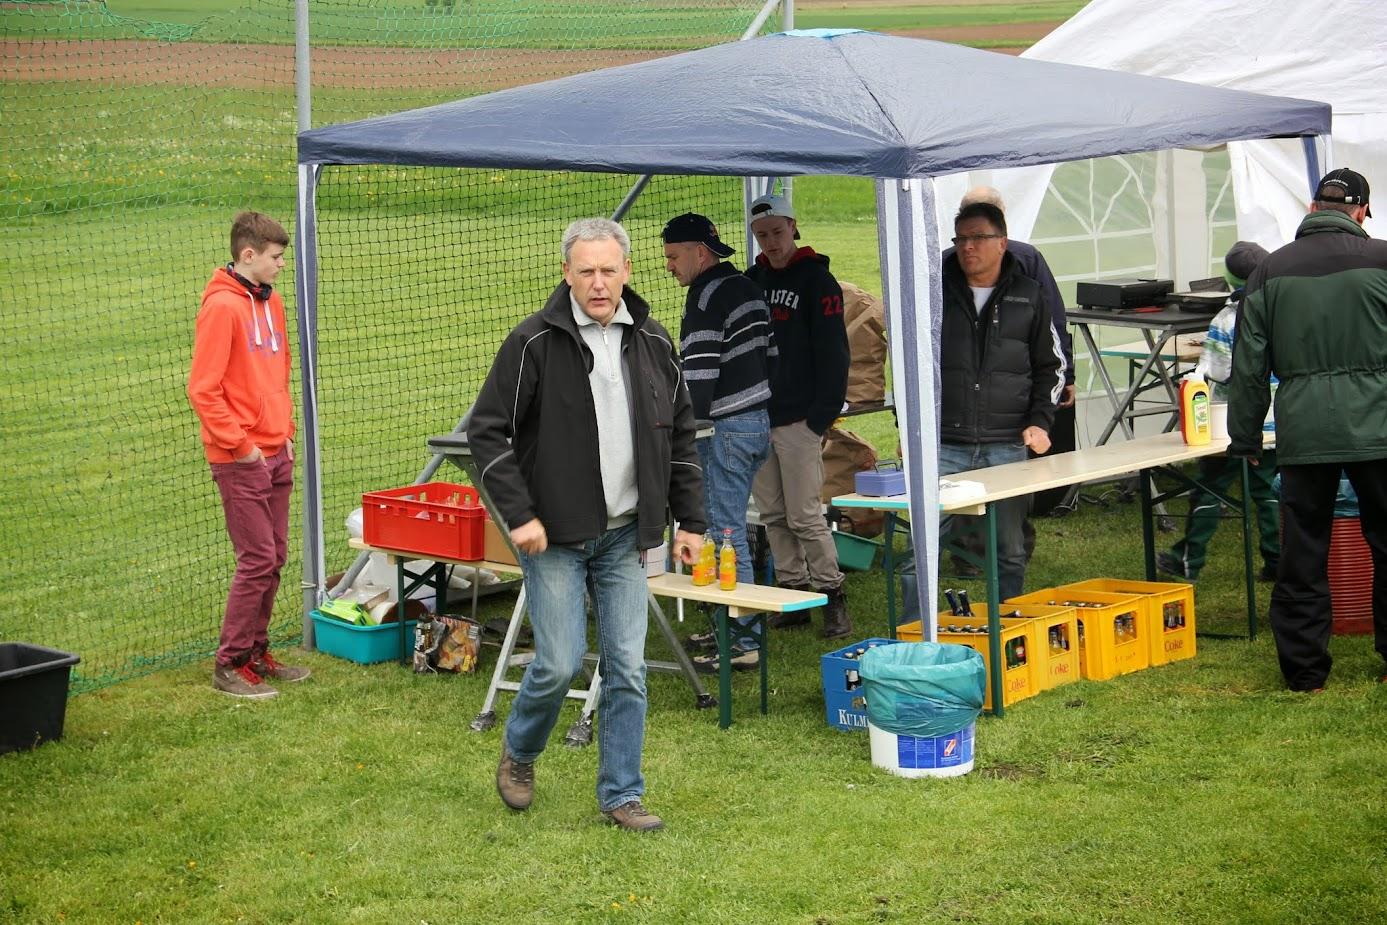 03.05.14 MFV Hofbieber